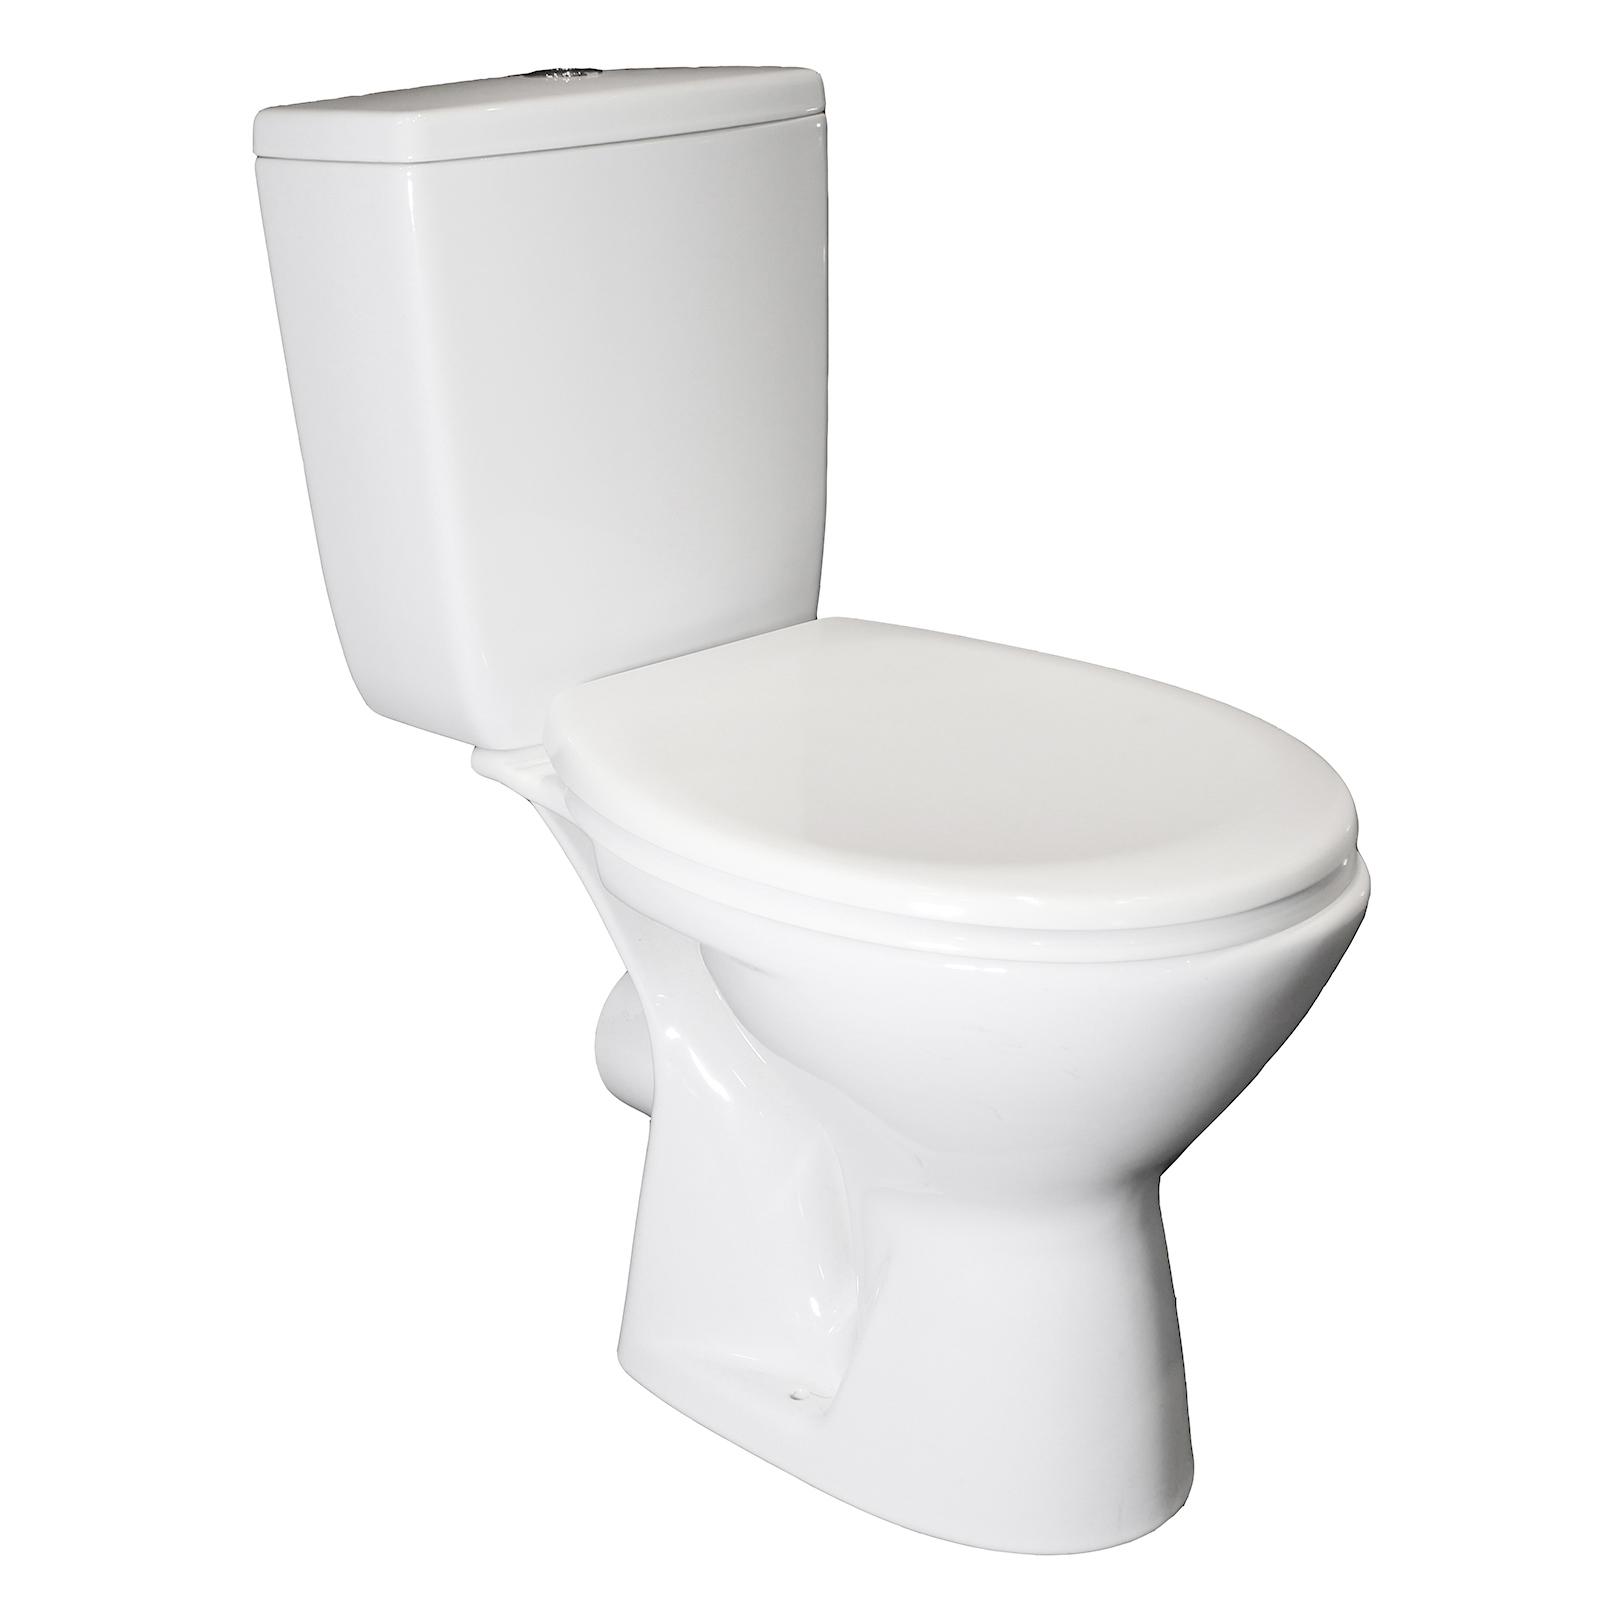 Cersanit Senator Close Coupled Toilet With Soft Close Seat